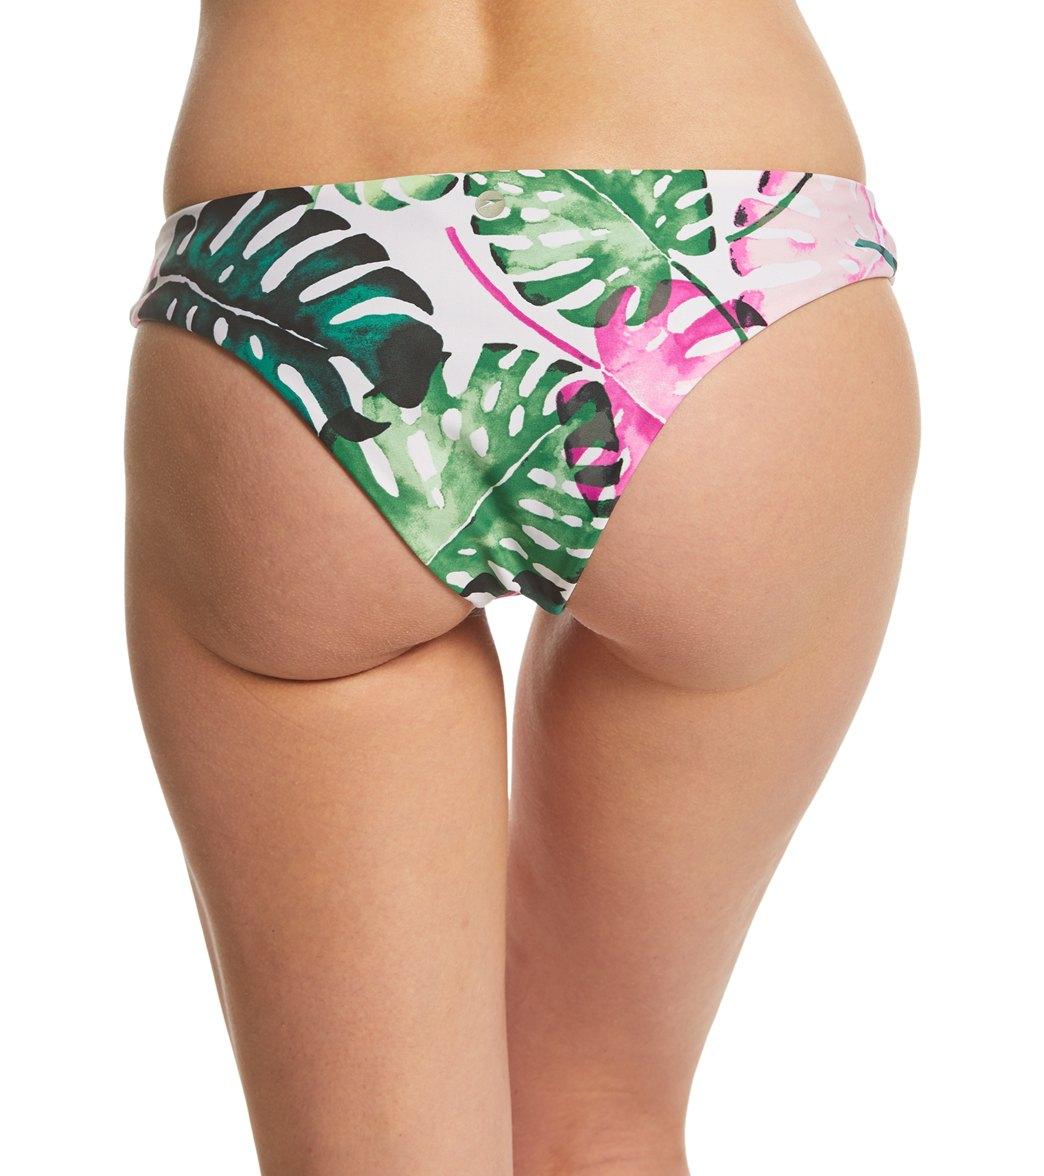 8cc20d7c588 Speedo Women's Printed Emily Hipster Bikini Bottom at SwimOutlet.com ...